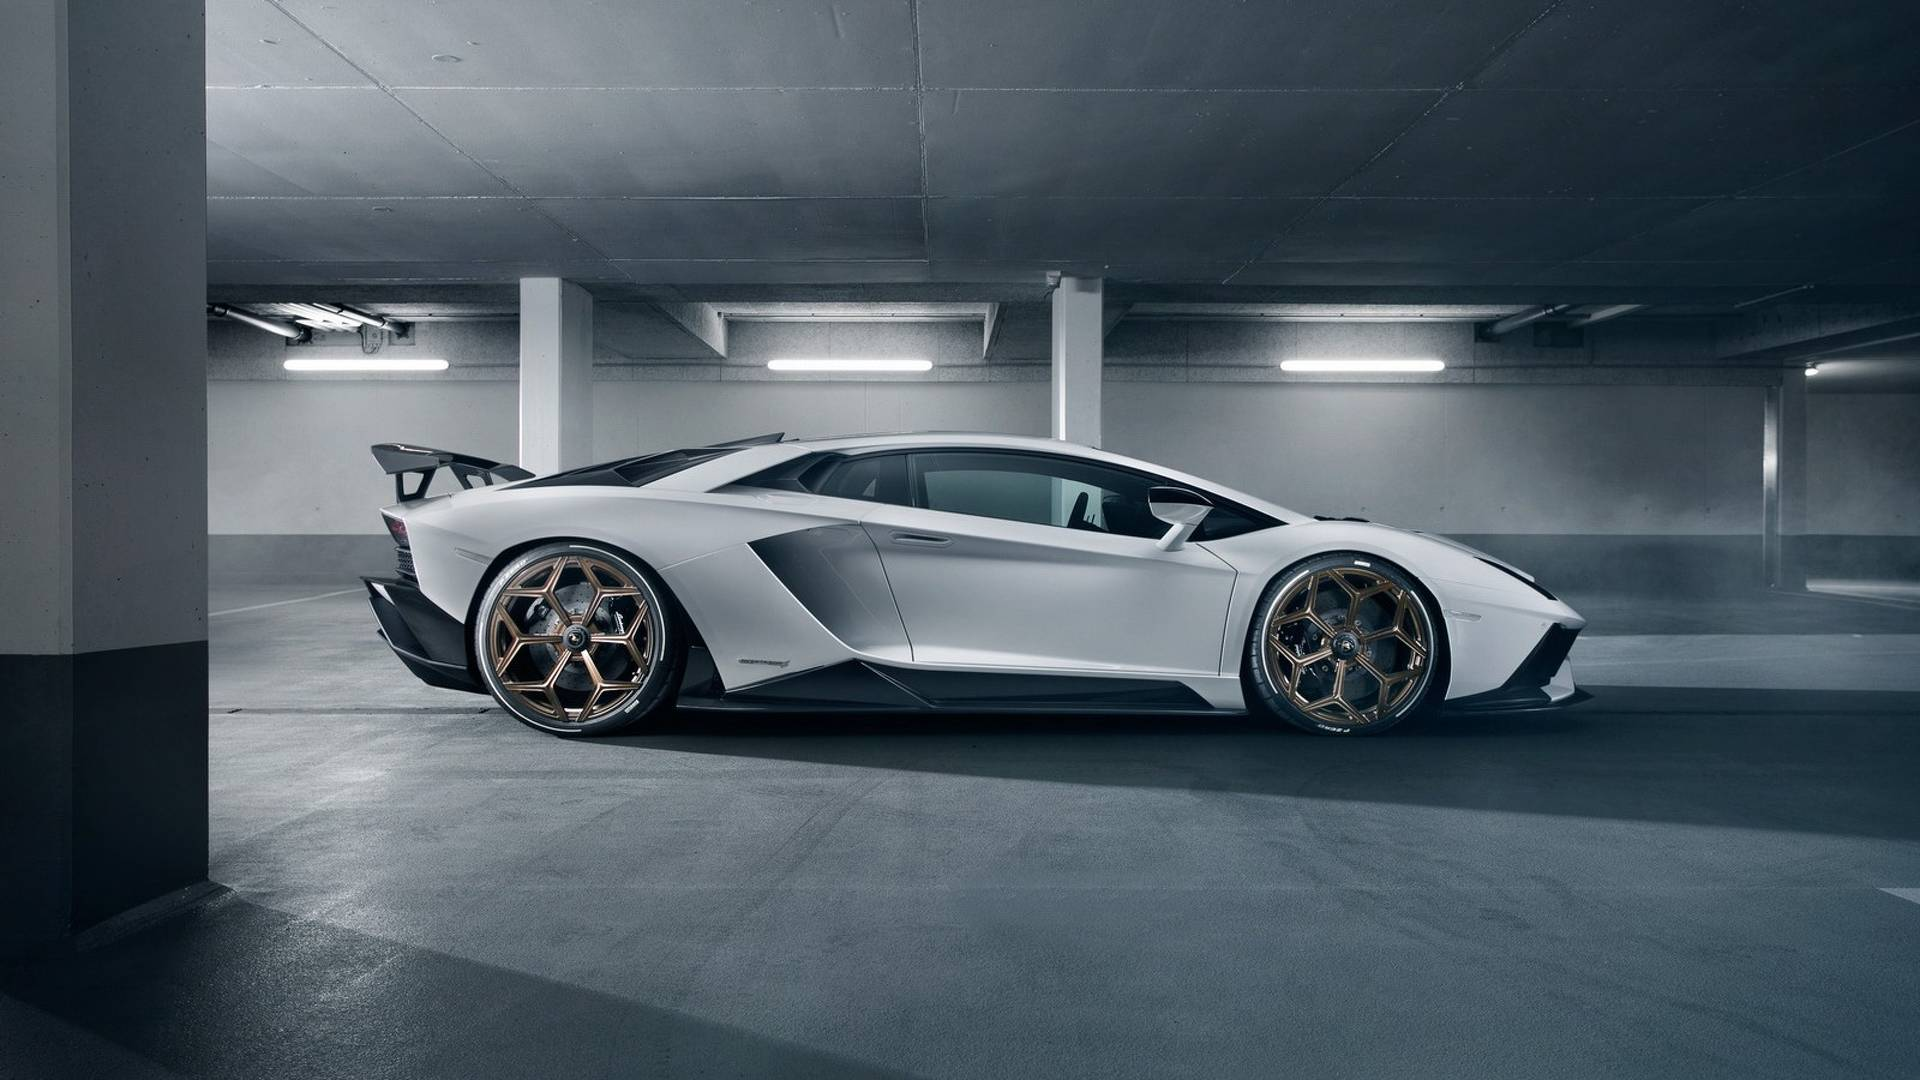 Lamborghini Aventador S By Novitec Adds Lightness And Power on land rover defender on rims, nissan leaf on rims, eagle talon on rims, hyundai veloster on rims, mini countryman on rims, mercedes-benz g-class on rims, toyota sienna on rims, rolls-royce ghost on rims, pontiac firebird on rims, chevrolet camaro on rims, audi r8 on rims, ford super duty on rims, volkswagen phaeton on rims, land rover freelander on rims, srt viper on rims, volvo xc60 on rims, honda s2000 on rims, nissan gt-r on rims, maserati grancabrio on rims, lexus lfa on rims,